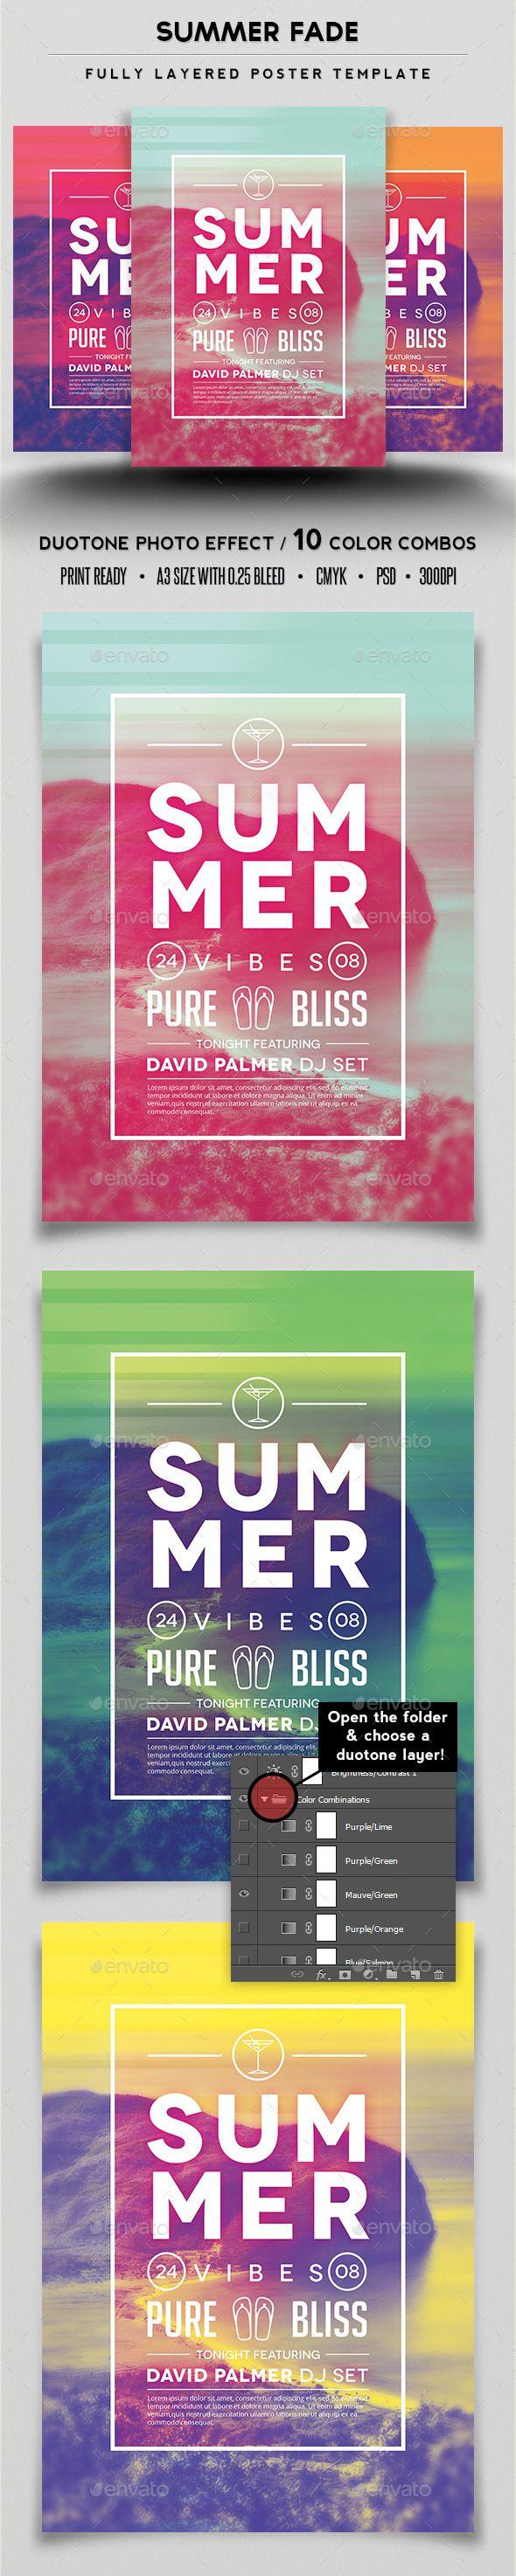 Summer Fade Poster Template #design Download: http://graphicriver.net/item/summer-fade-poster-template/12751977?ref=ksioks